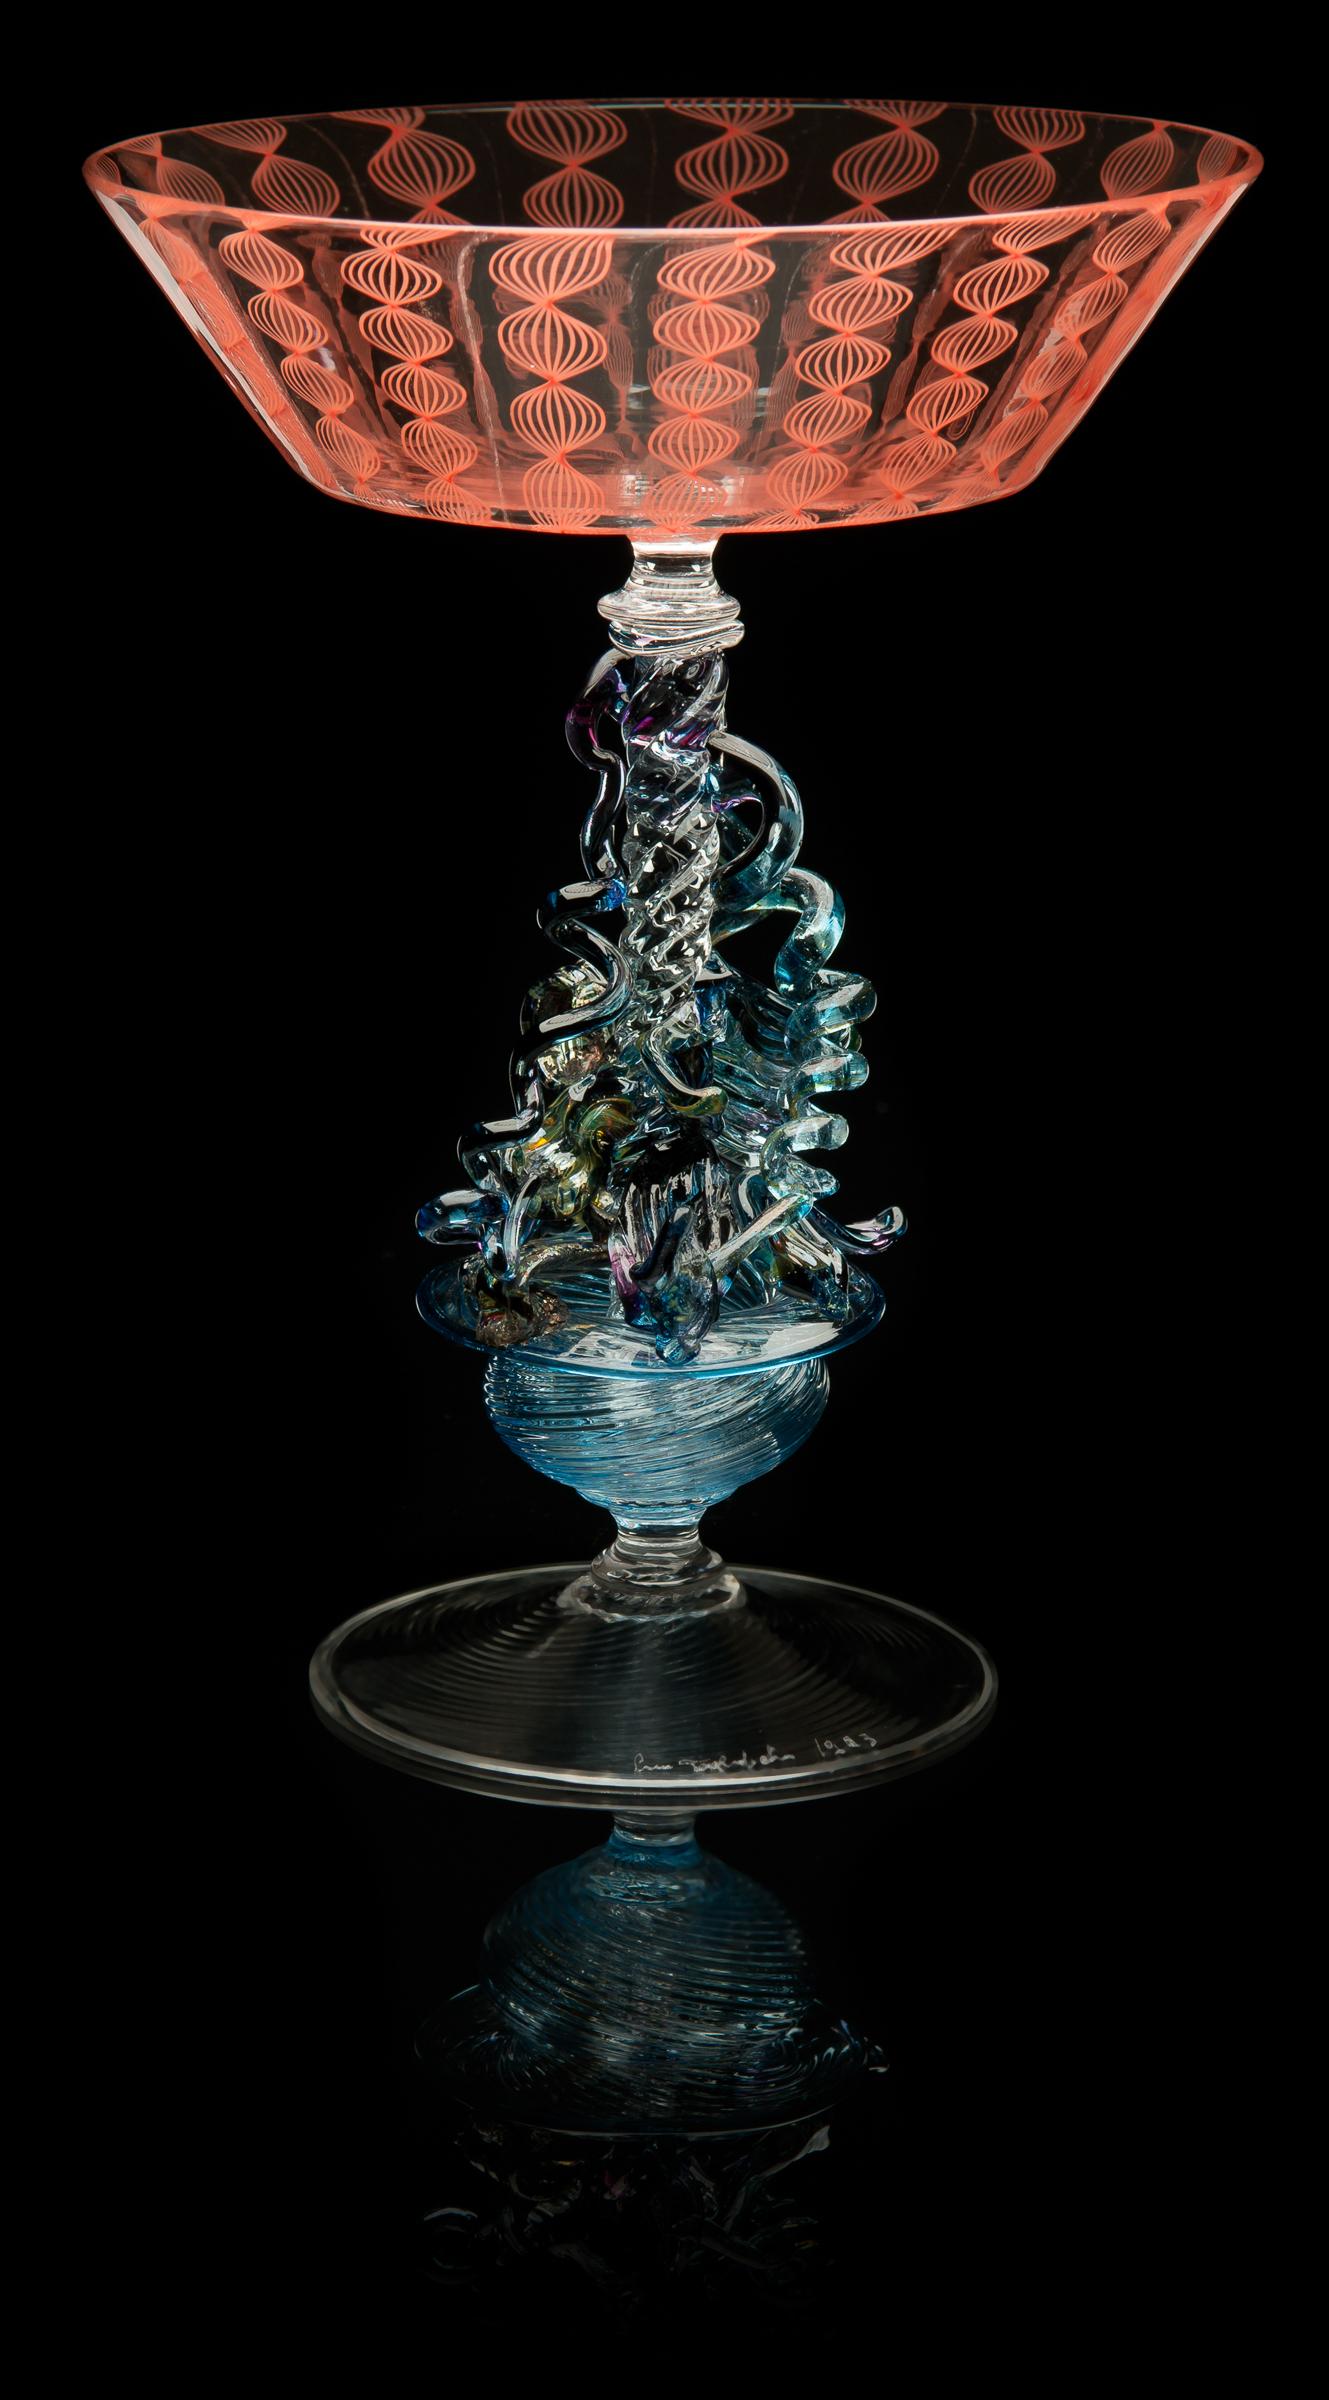 Lino Tagliapietra, Goblet (1991-1994, glass, 7 3/16 x 5 1/2 x 5 1/2inches), LT.31